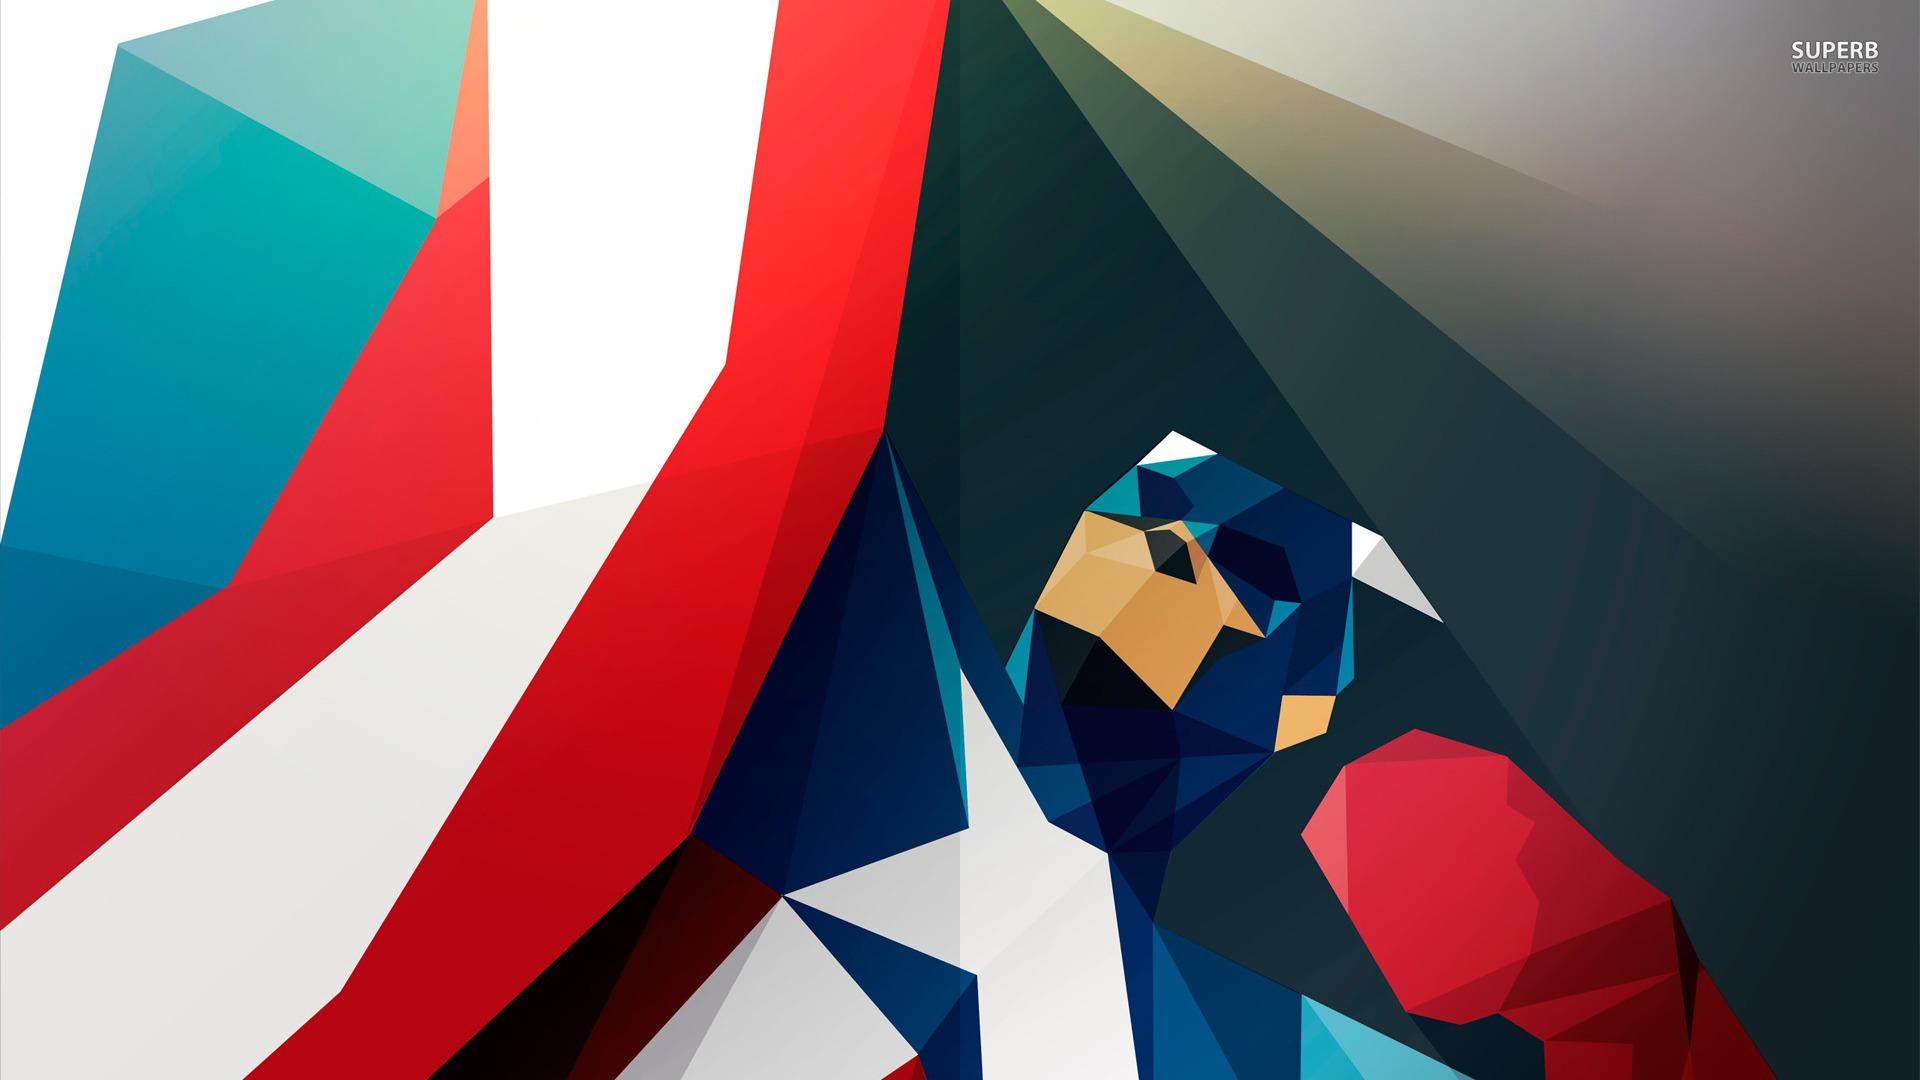 wallpaper captain america cartoon desktop desktop1 1920x1080